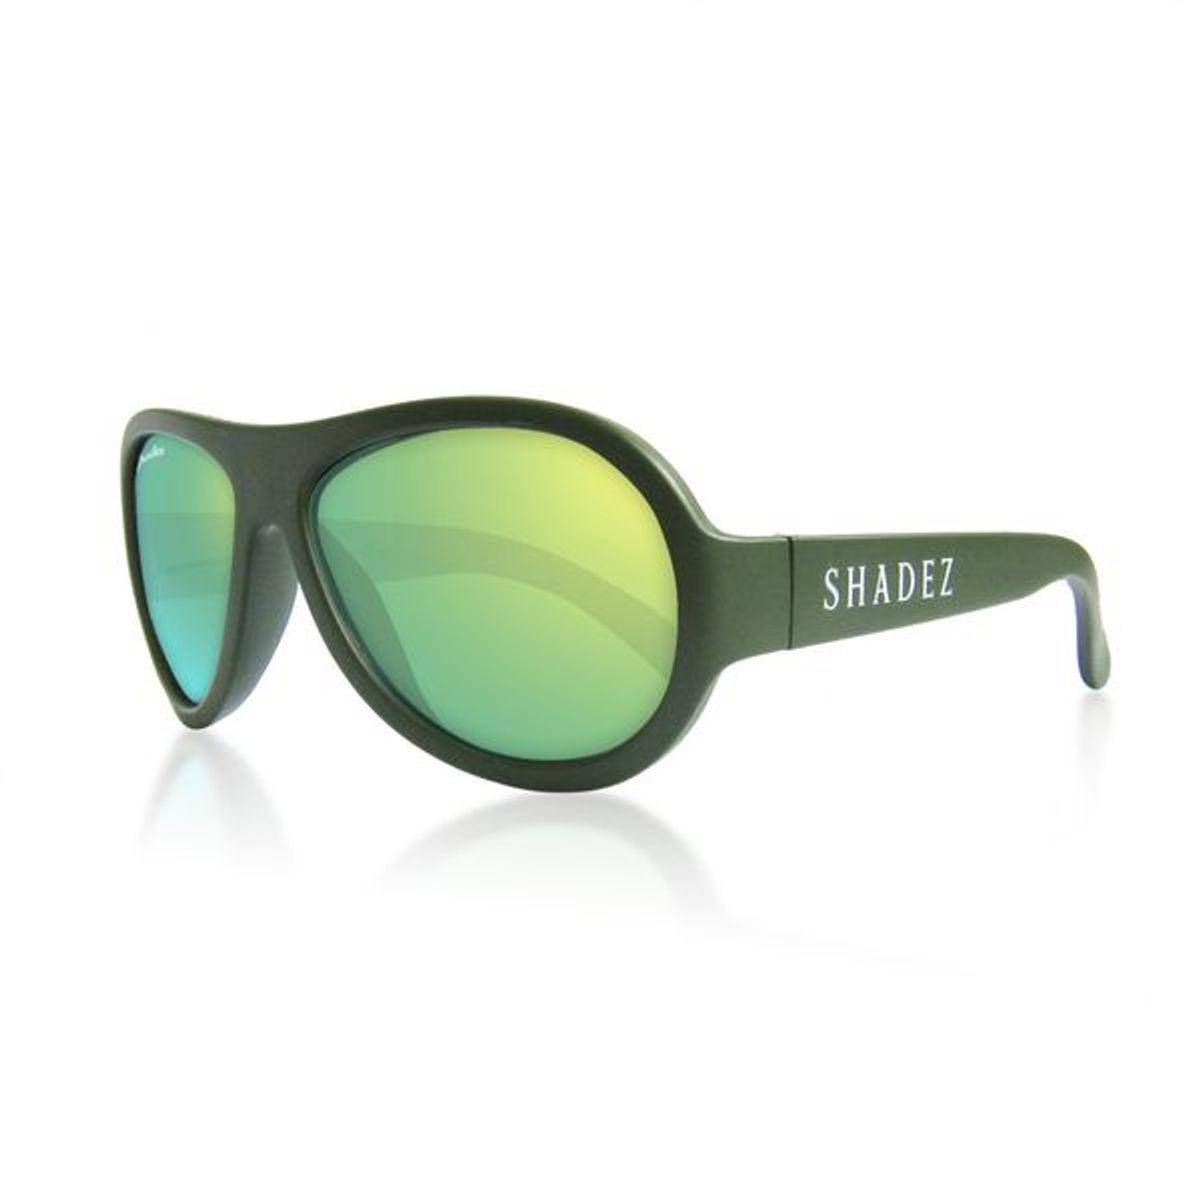 Shadez Simen Baby Solbrille, Mose